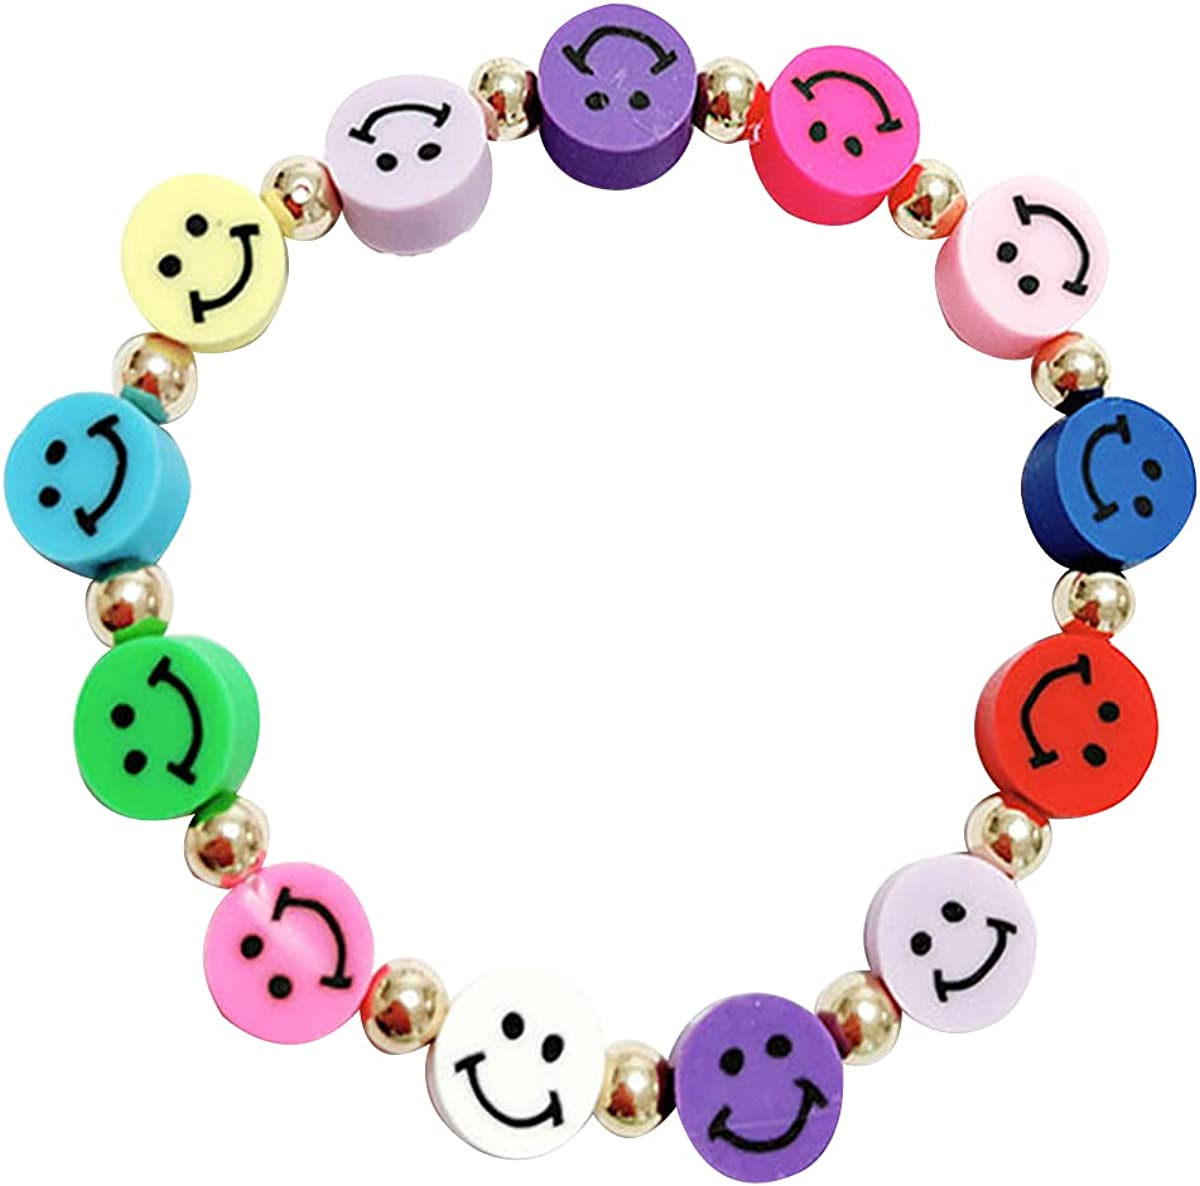 Polymer Clay Beads Bracelet Smiley Face Flower Pearl Rainbow Y2K Handmade Cute Elastic Beaded Bracelet for Women Girls